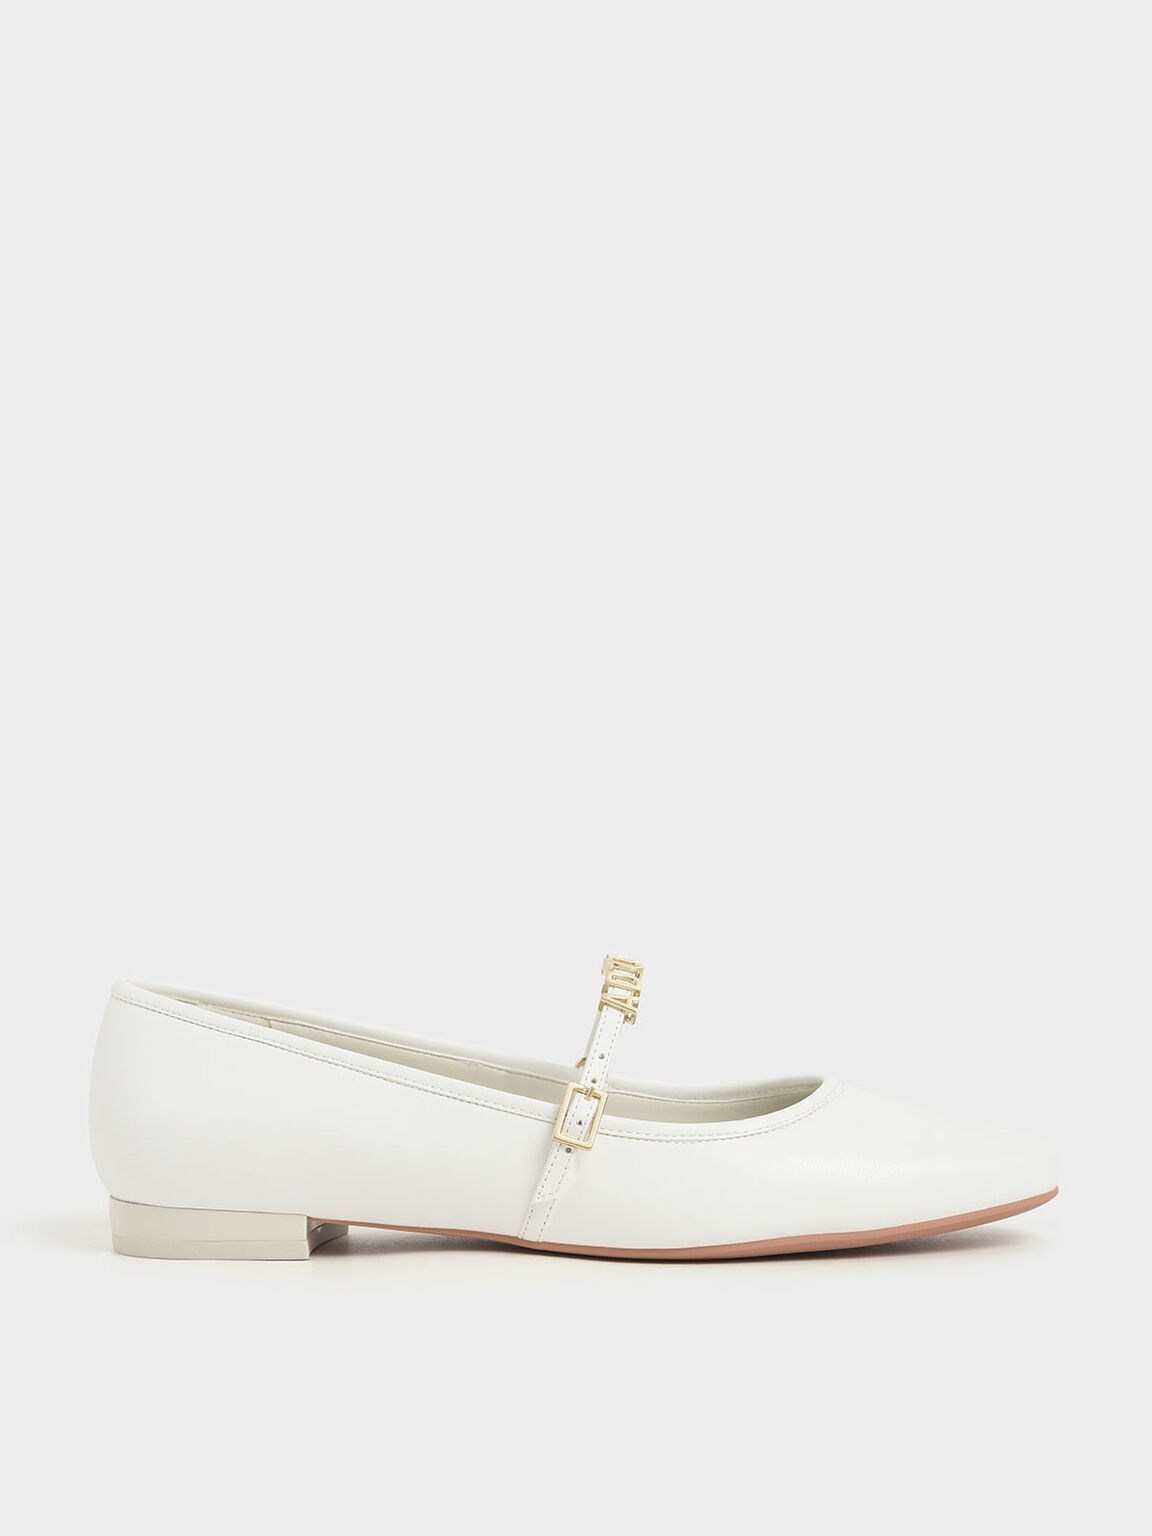 'Adore' Mary Jane Flats, White, hi-res